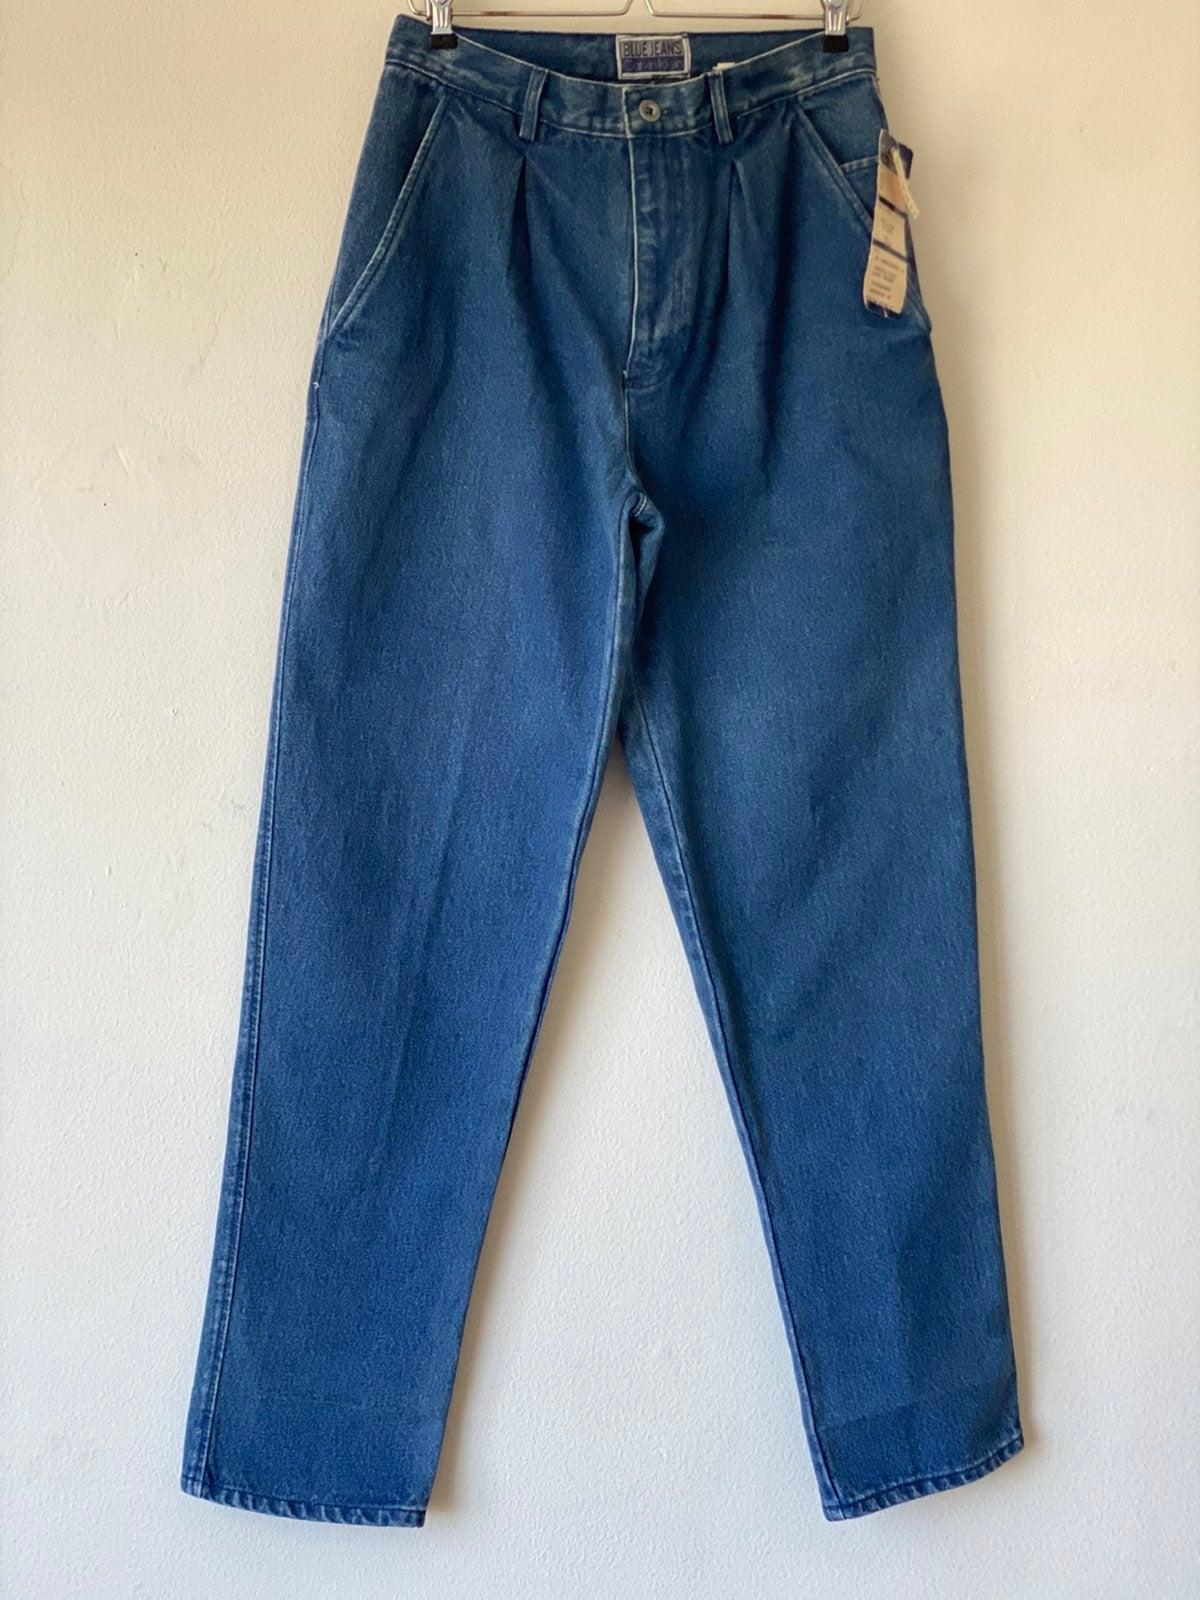 Vtg 80s Calvin Klein Blue Jeans Sz 32